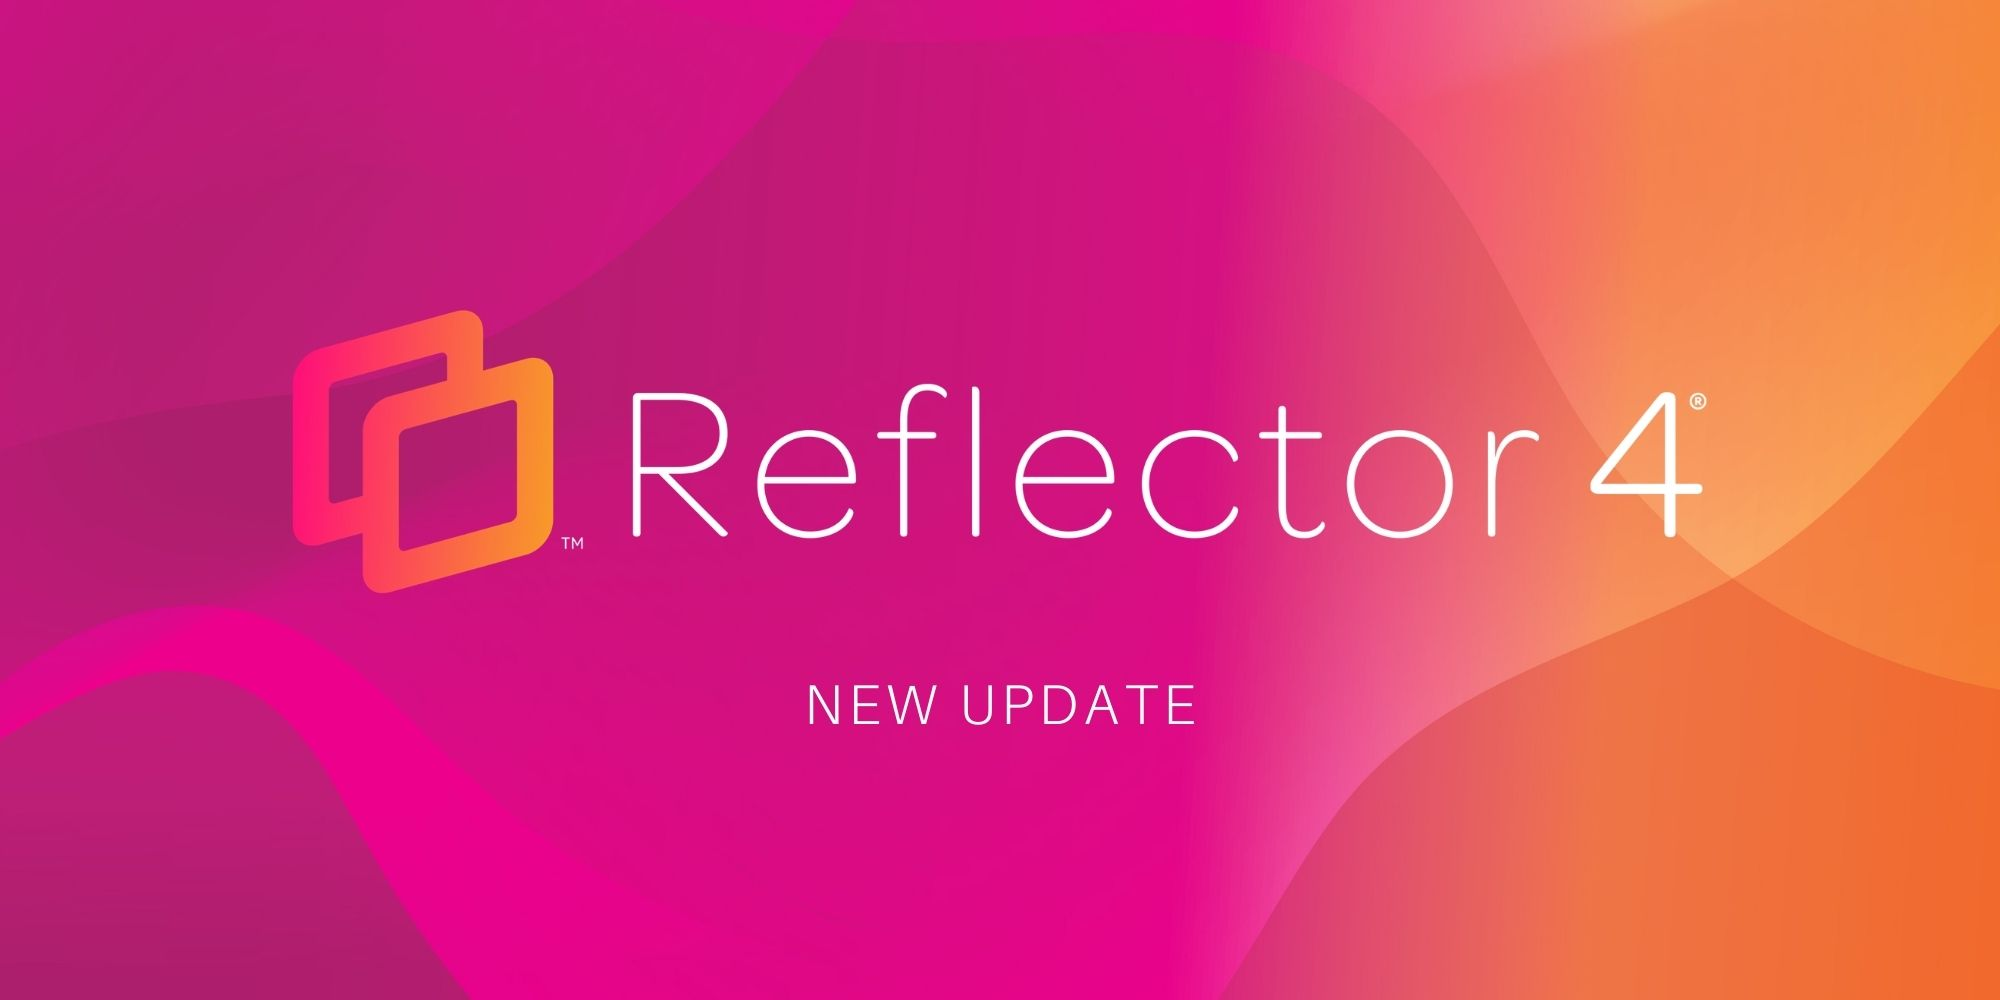 Reflector 4 New Update